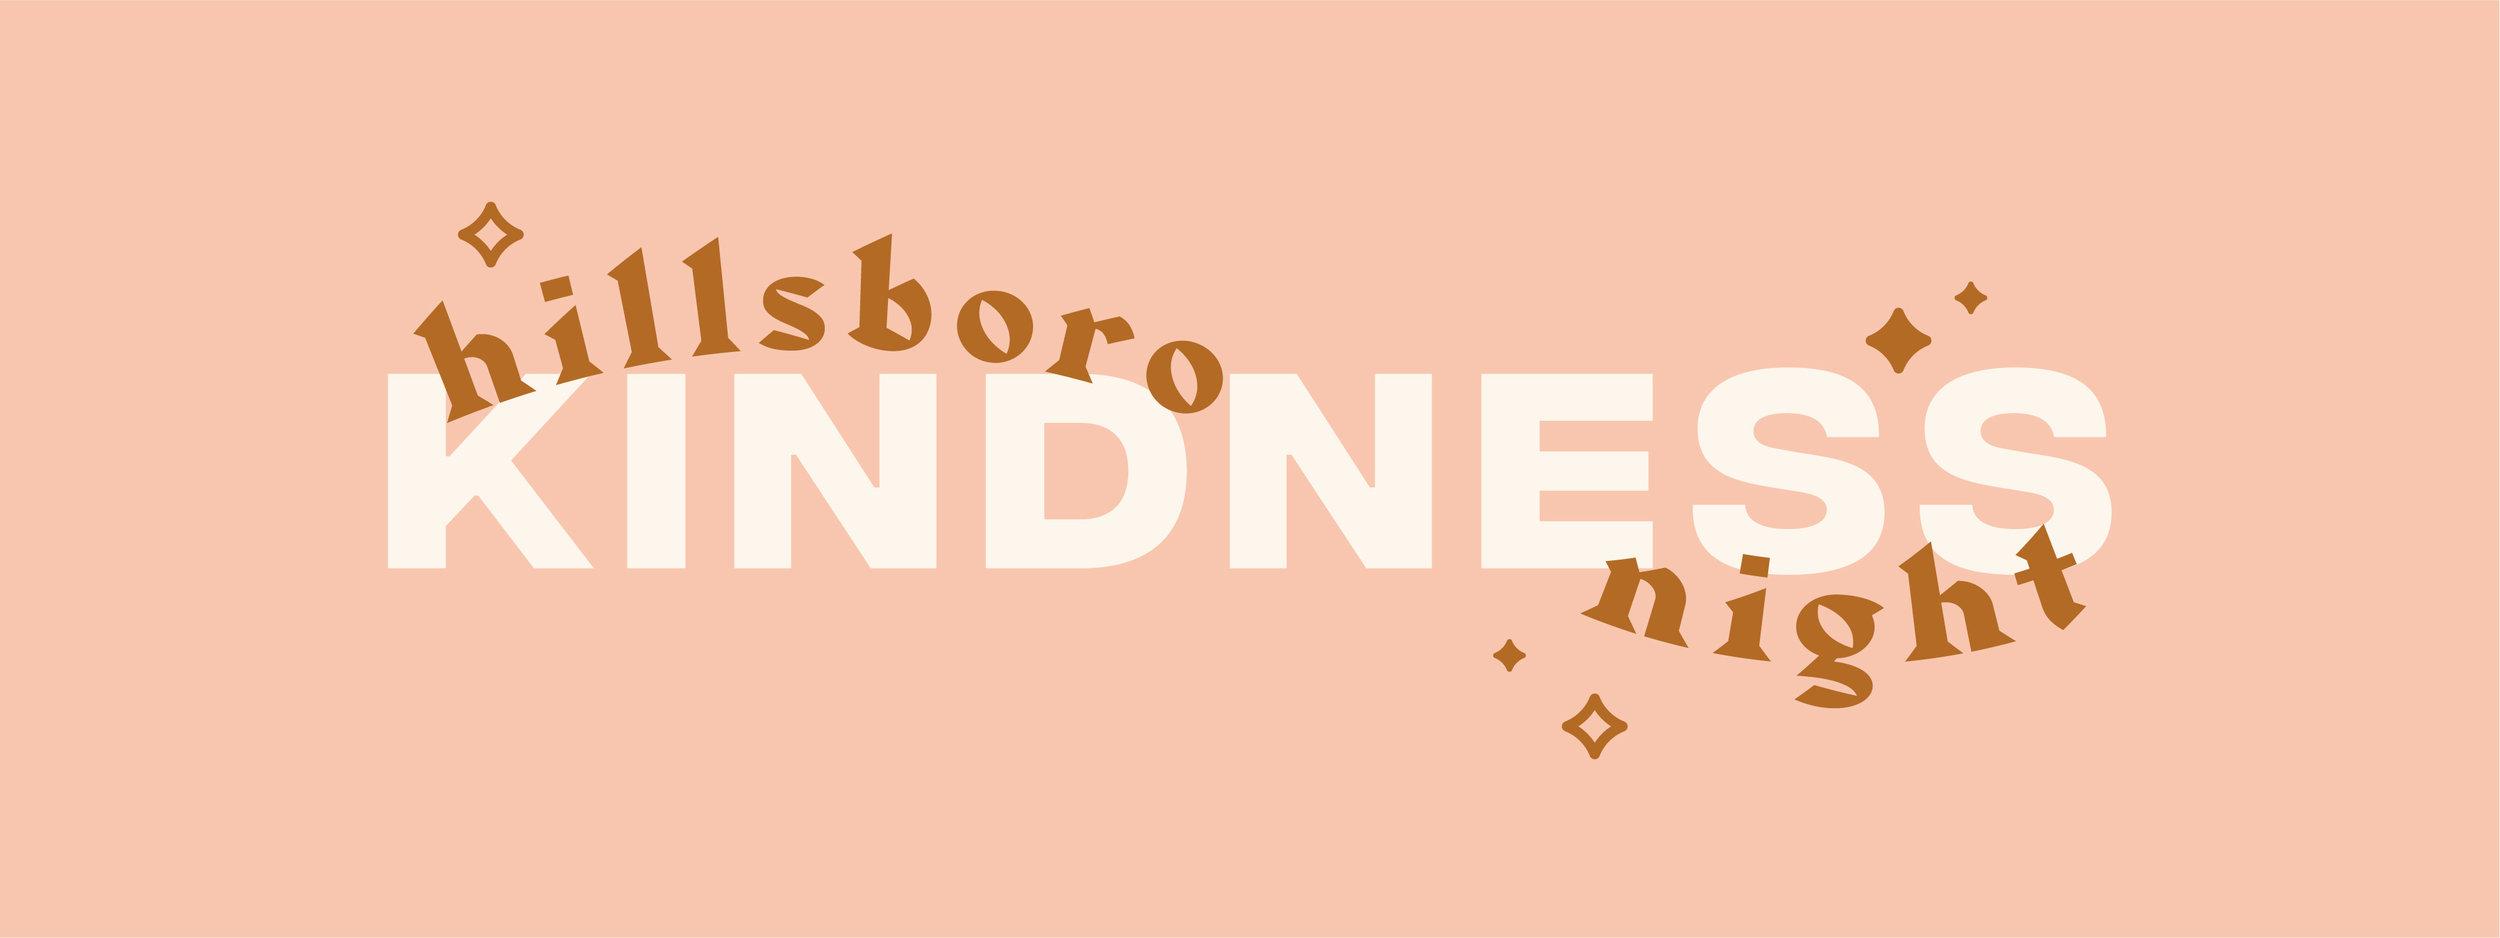 Kindness Night_Banner 2.jpg